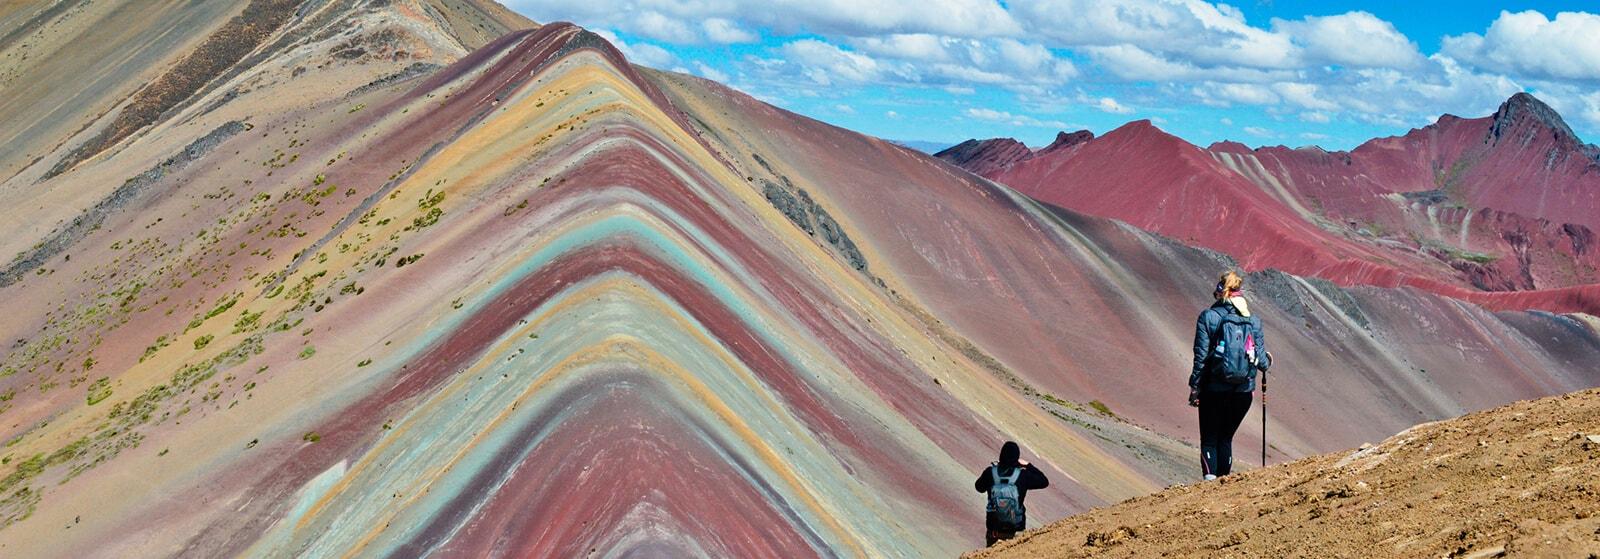 montana-de-colores-min